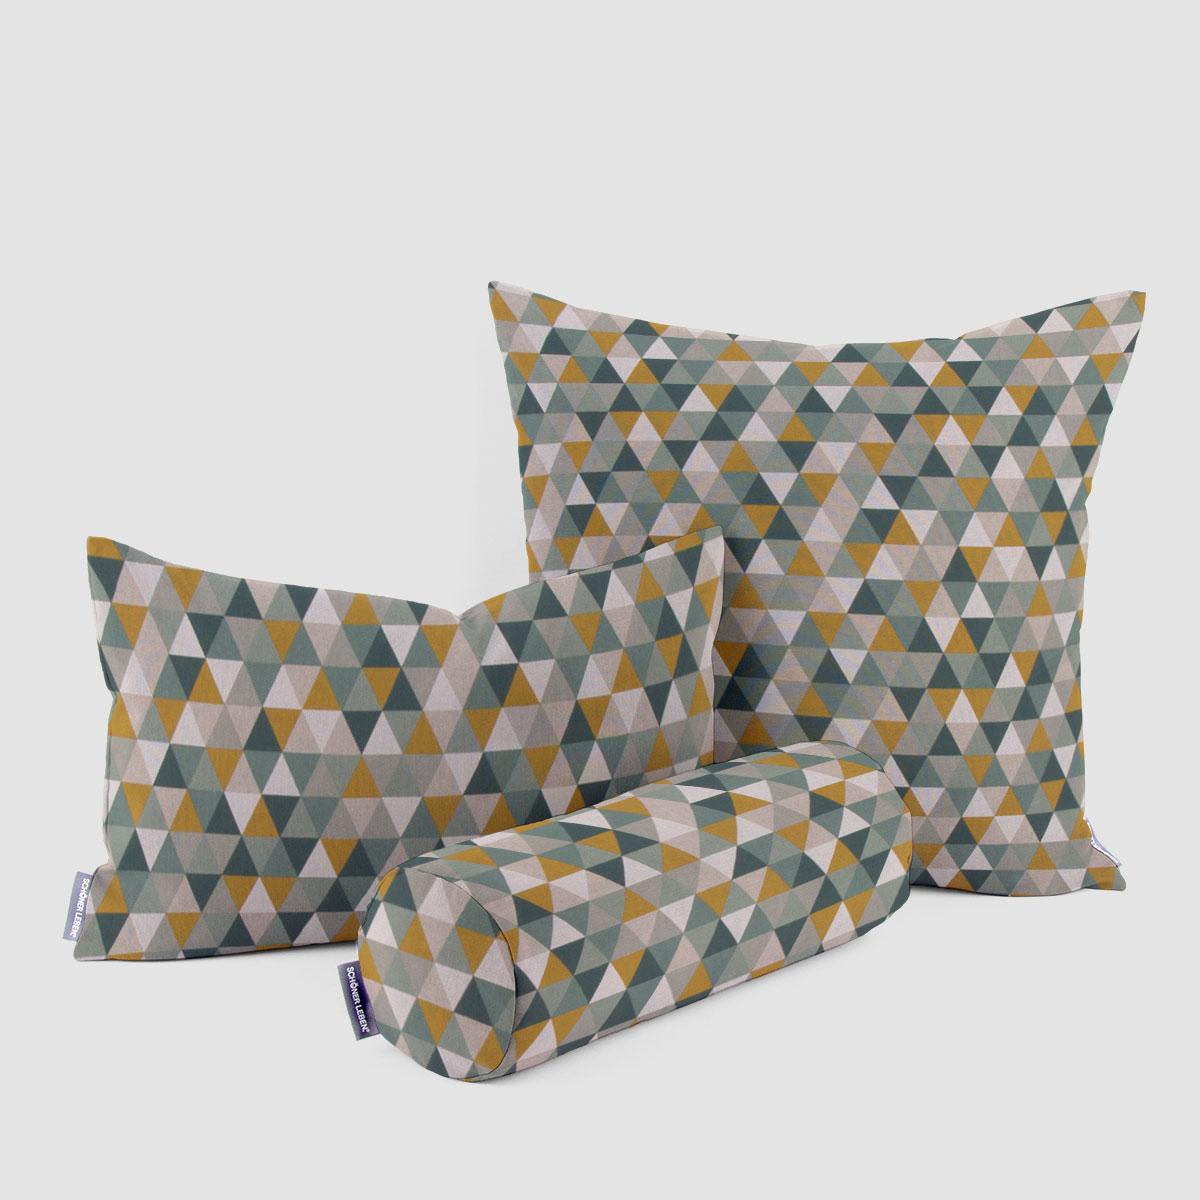 Mode Gelb Dreieck Geometrisch Kissenbezüge Bestickte Baumwolle Kissenhülle